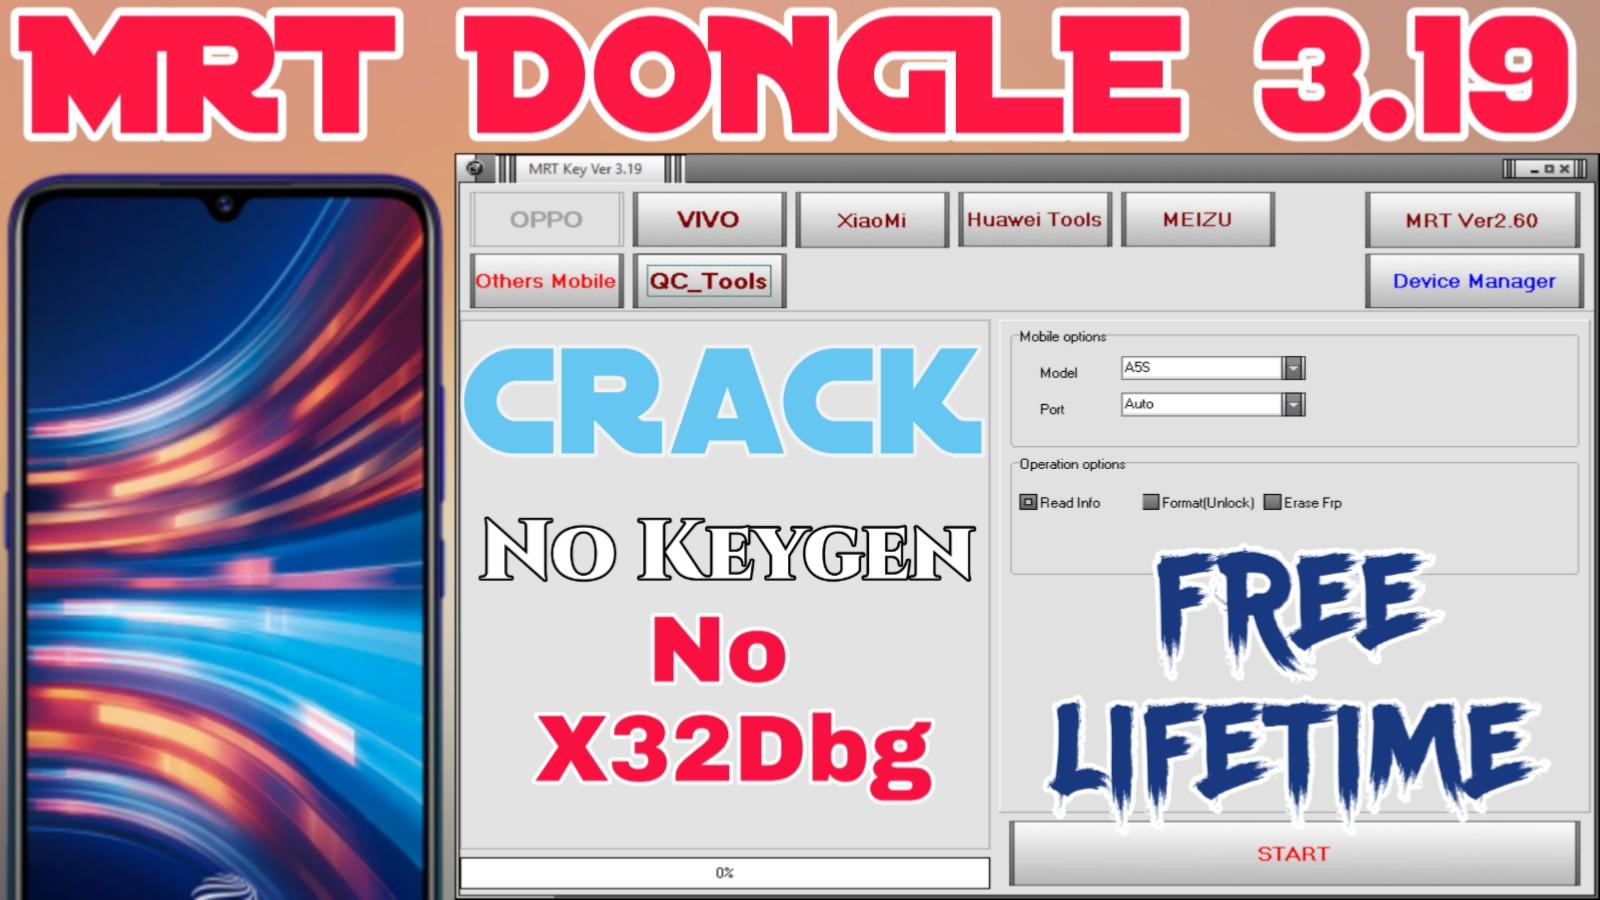 MRT Dongle V3.19 New Crack Setup With 100% Working (Windows 32Bit)